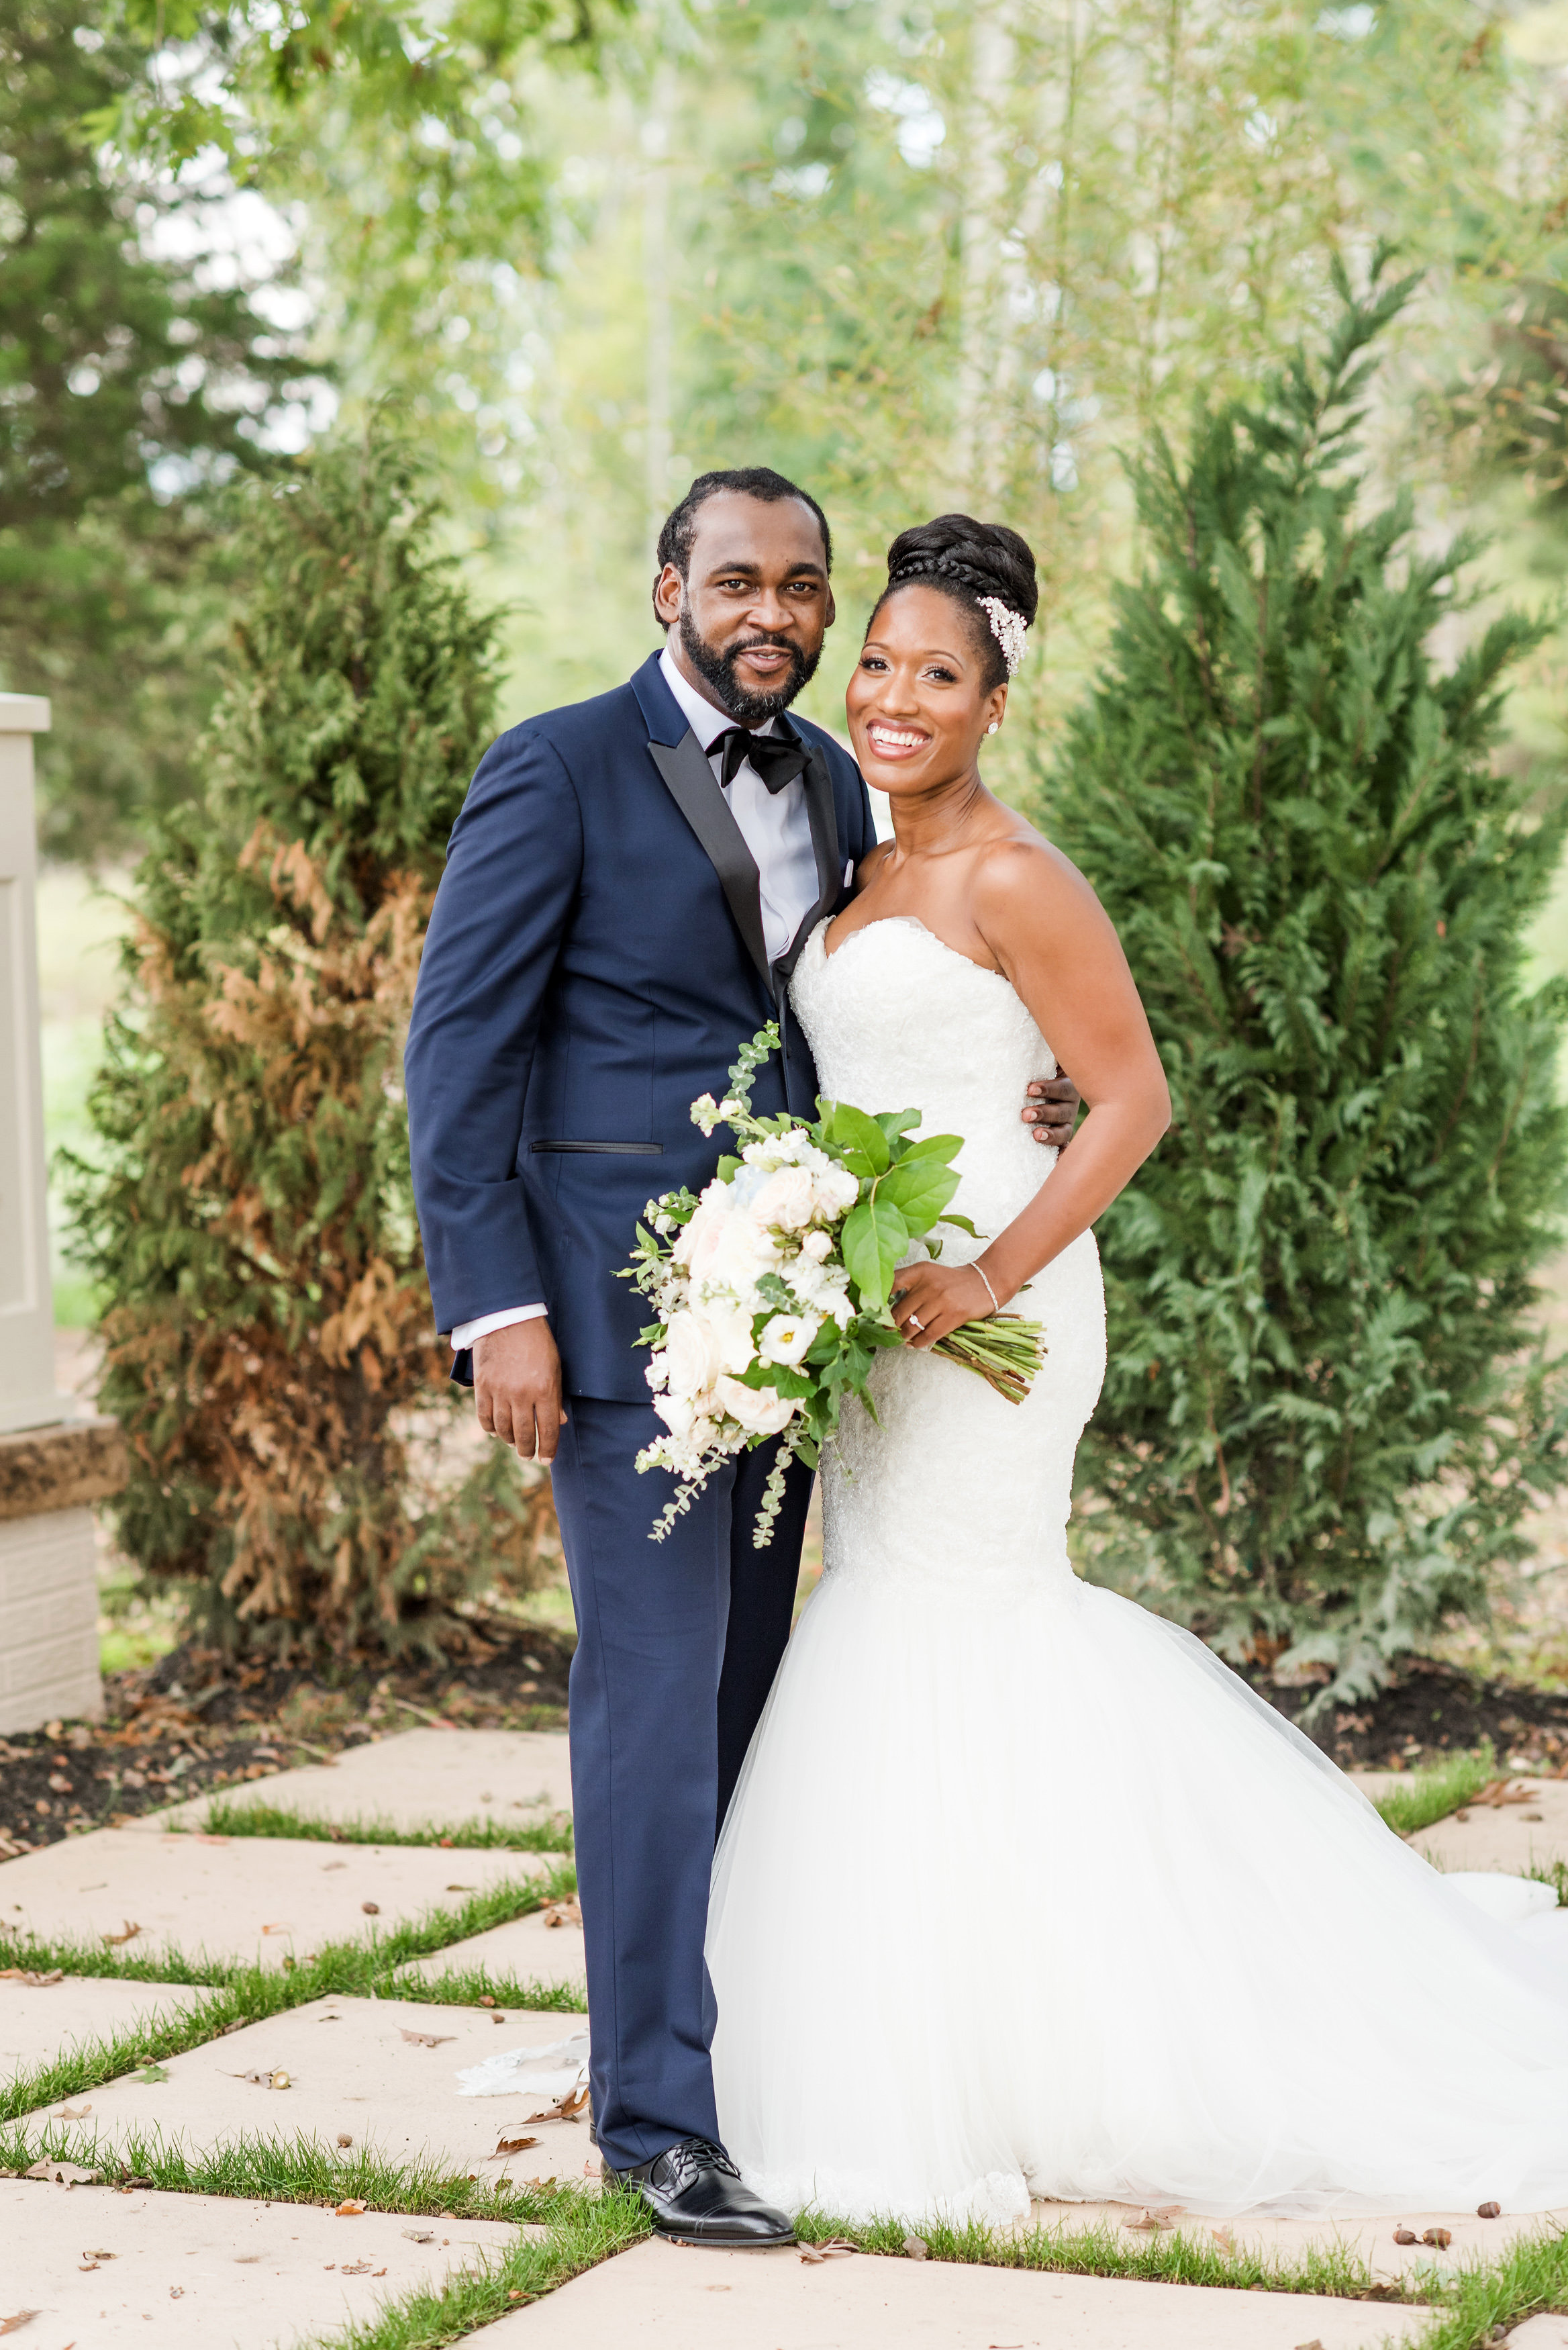 kenisha wendall wedding portrait couple posing